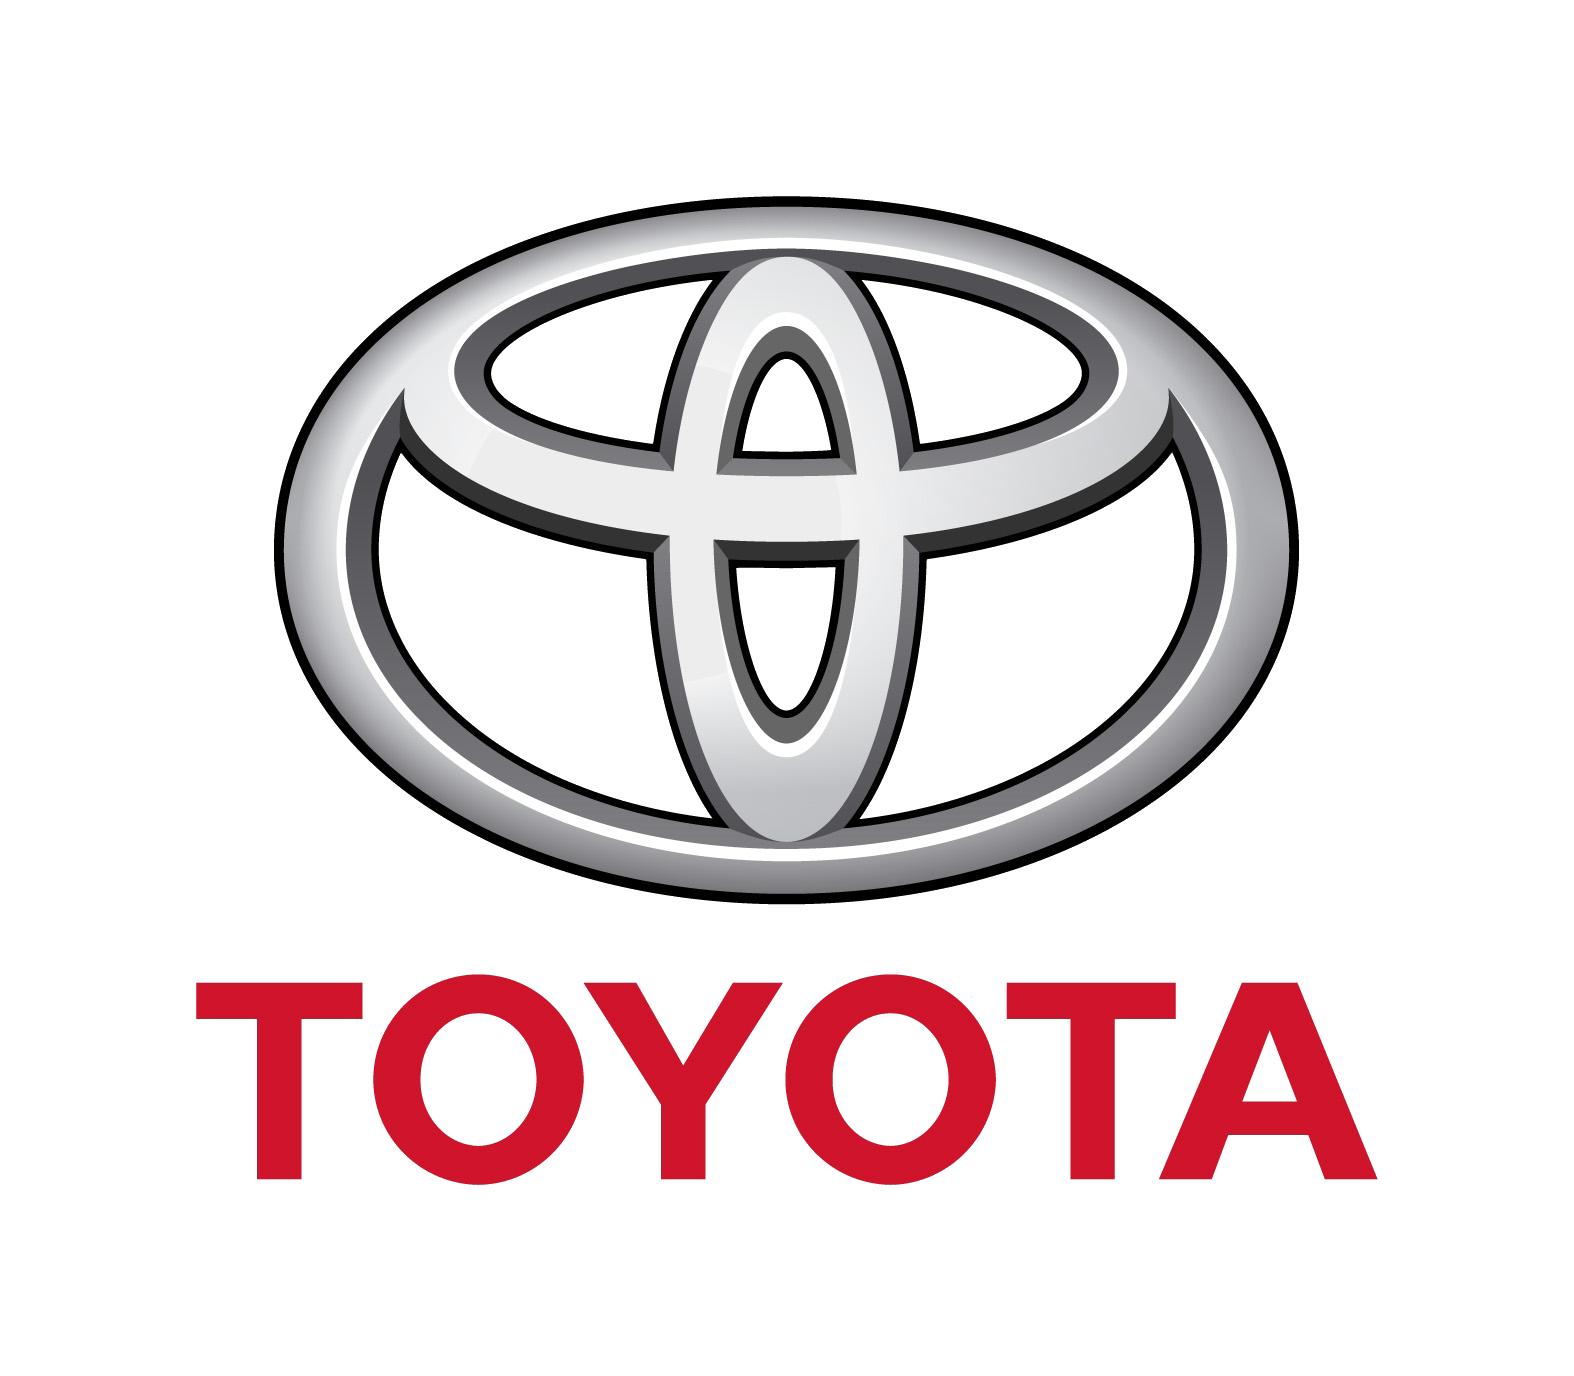 Toyota Logo PNG Transparent Images.